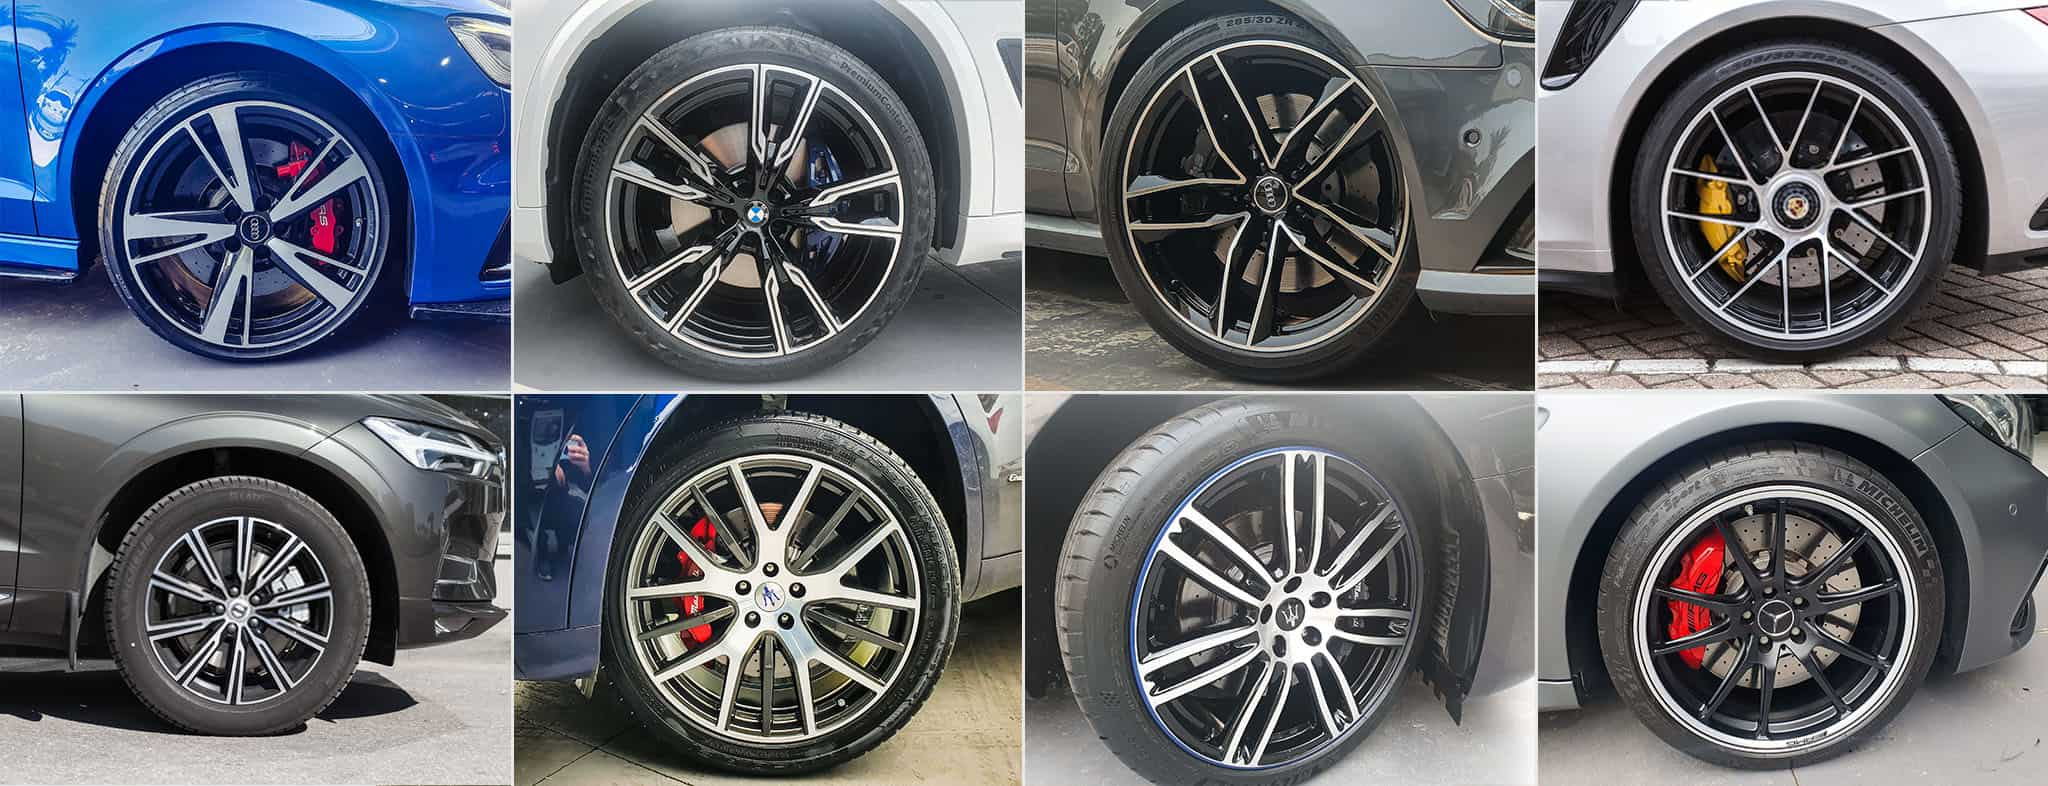 machine face alloy wheel repair service